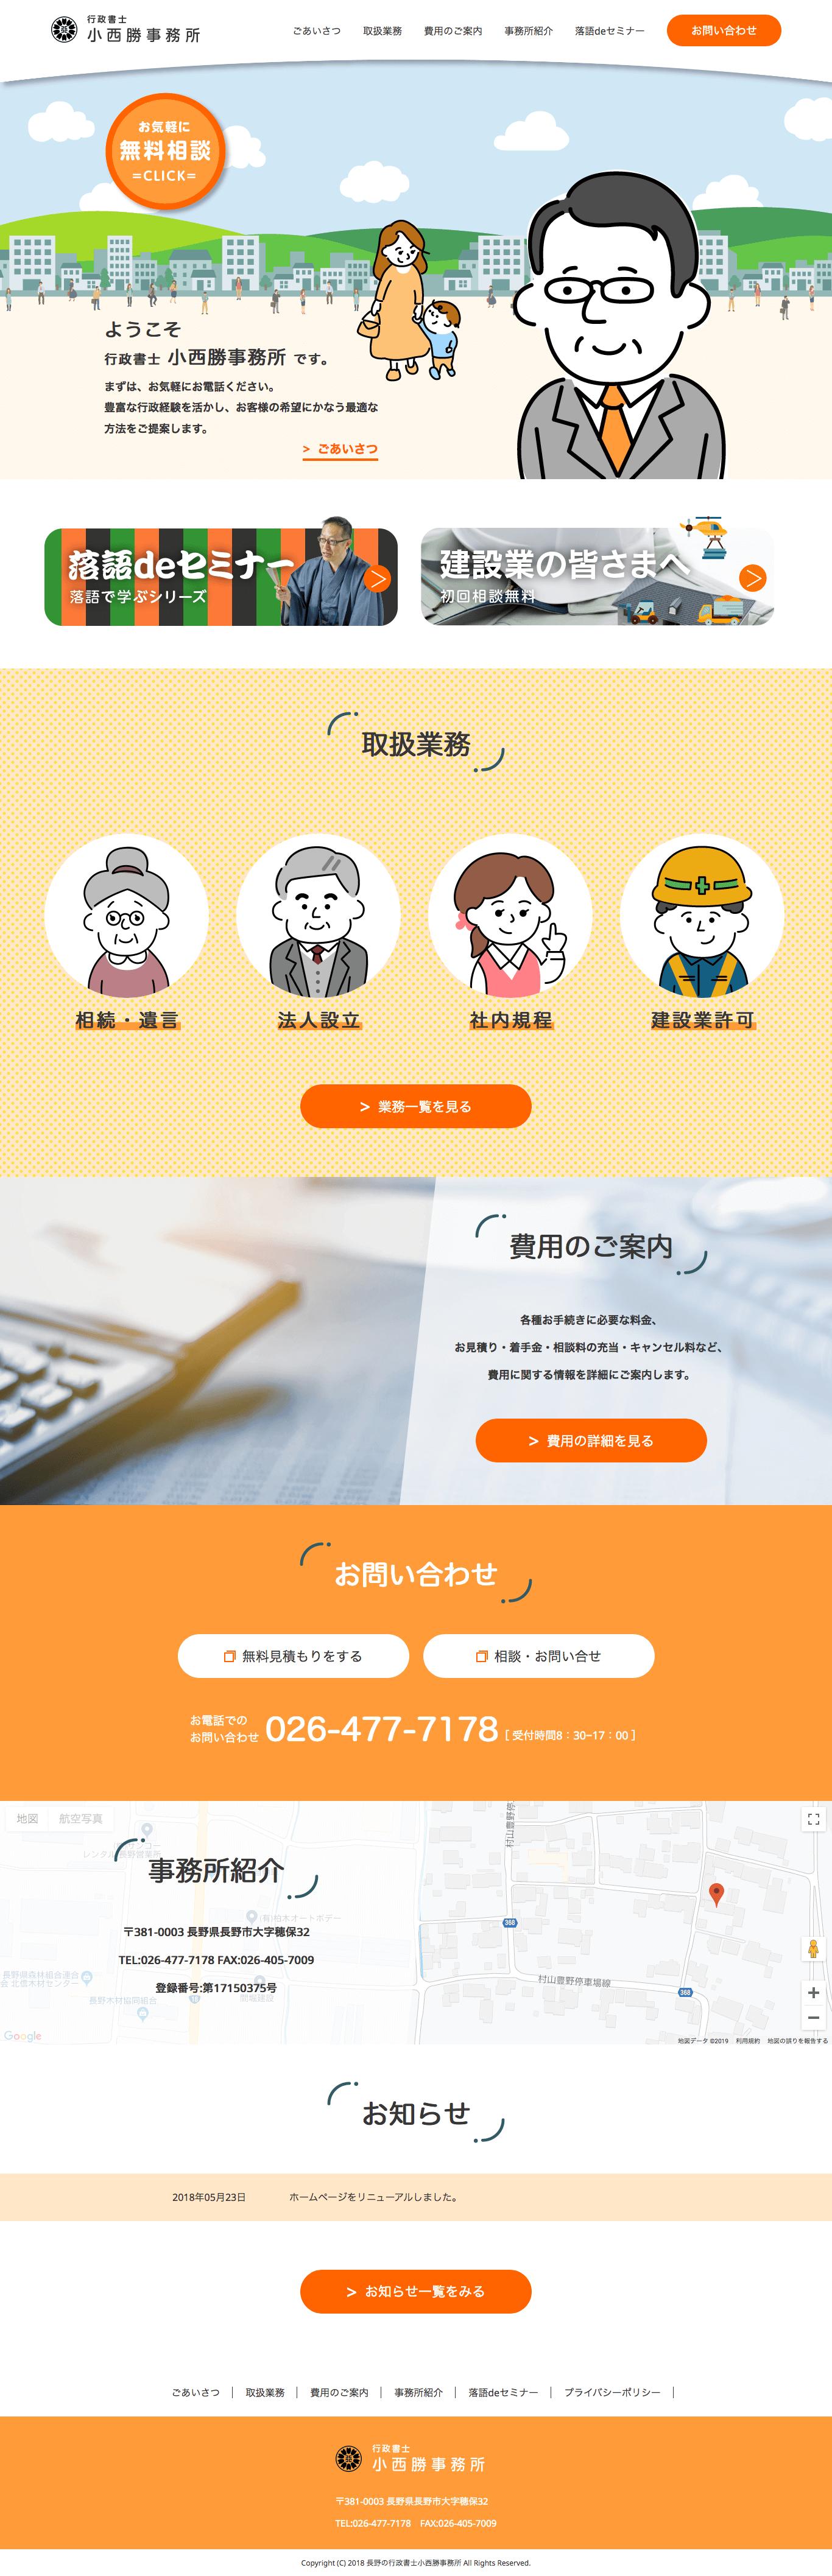 行政書士 小西勝事務所pcイメージ